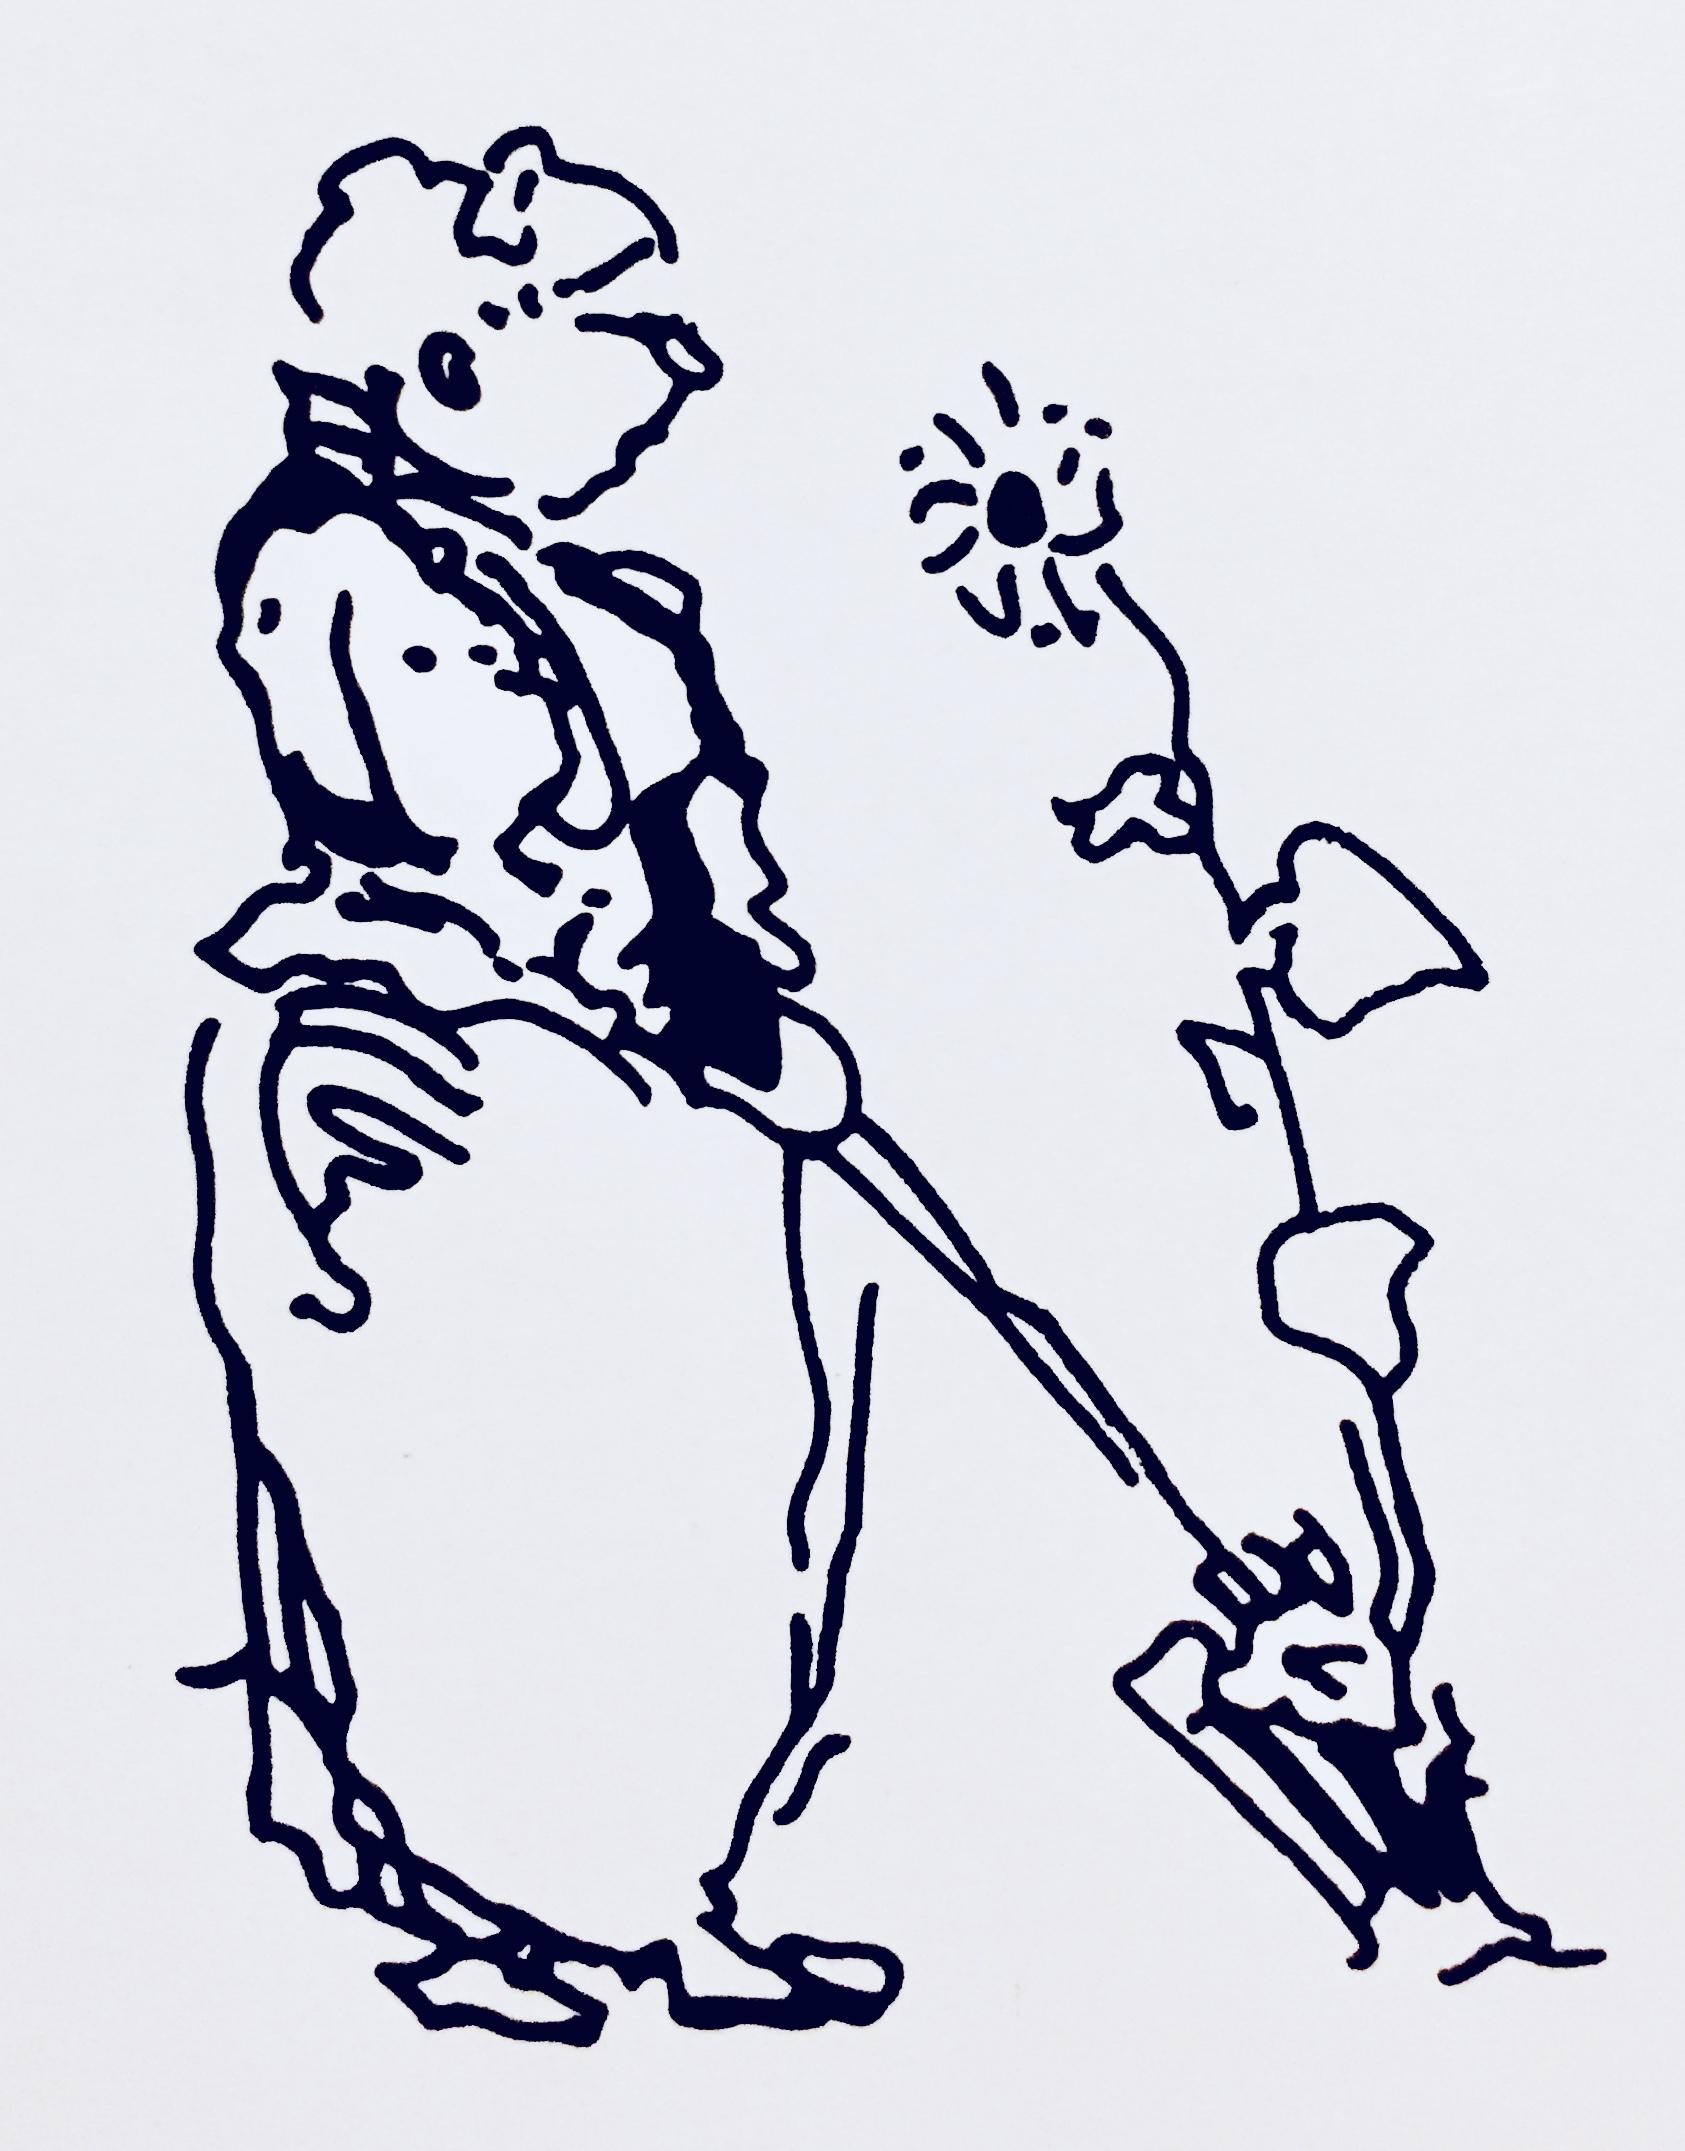 Edwin Lutyens sketch of his friend and collaborator (Redrawn version - original ©RIBA Collection)